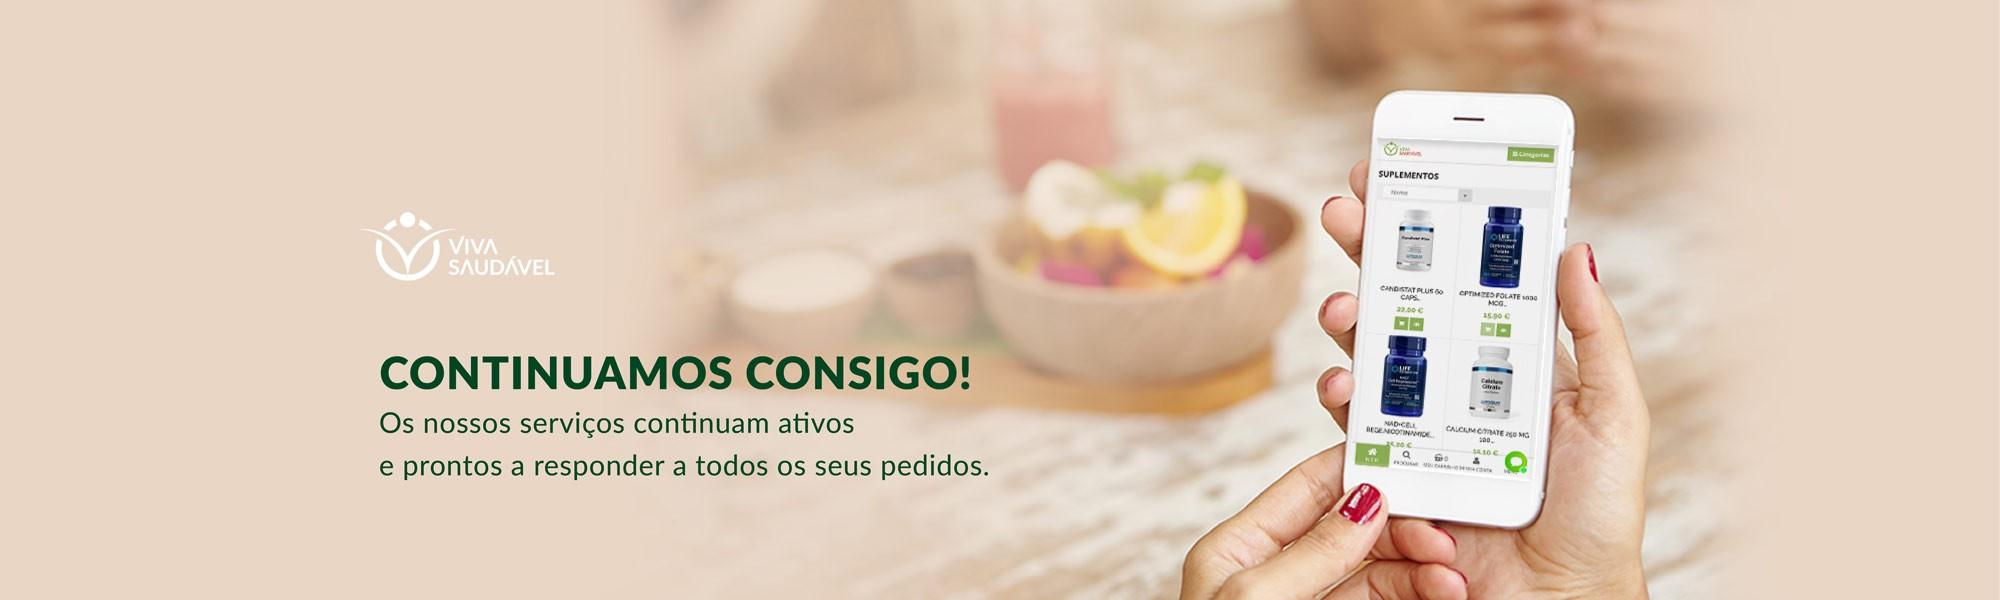 www.vivasaudave.pt